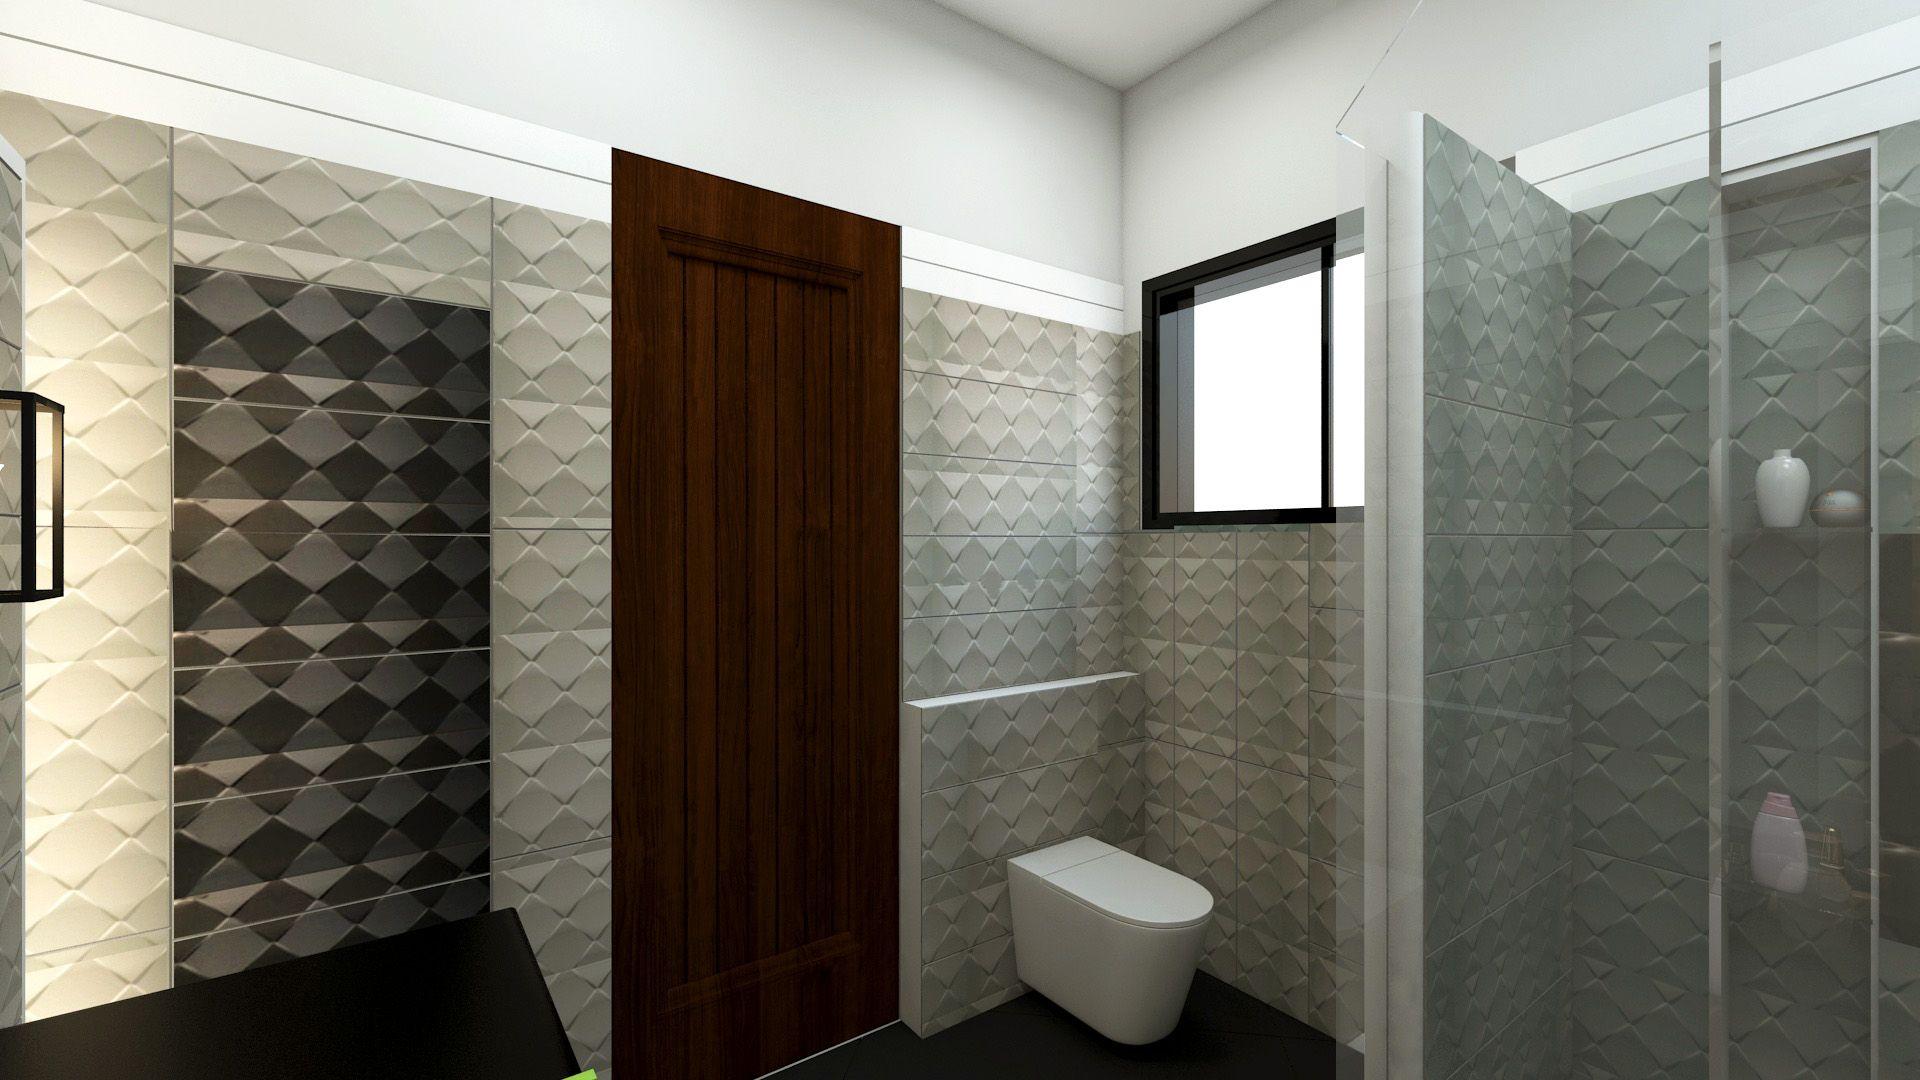 Latest Bathroominterior 3d Design Idea By Ameradnanassociates Interiordesign Architect Aaa Bathroom Interior Design Bathroom Design Bathroom Interior